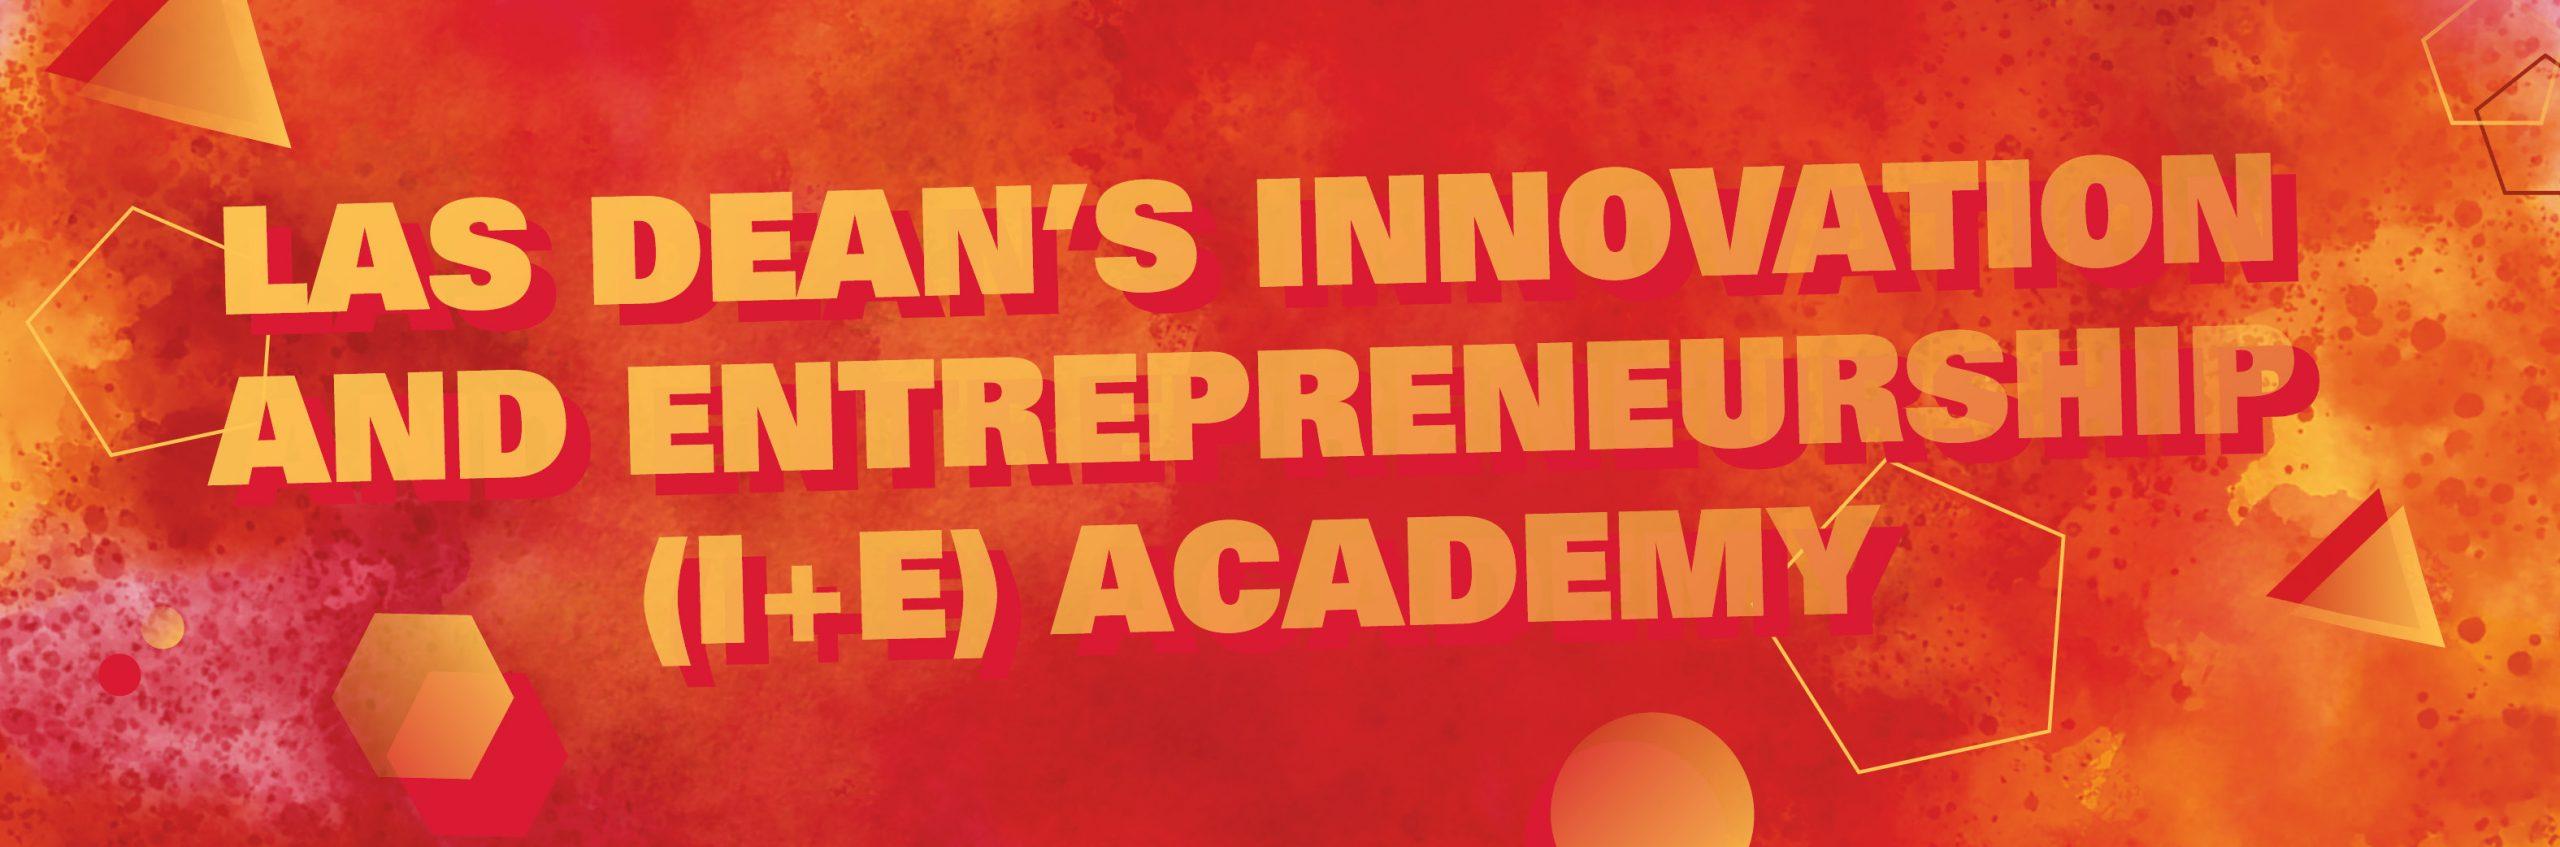 Deans Innovation and Entrepreneurship Academy Banner